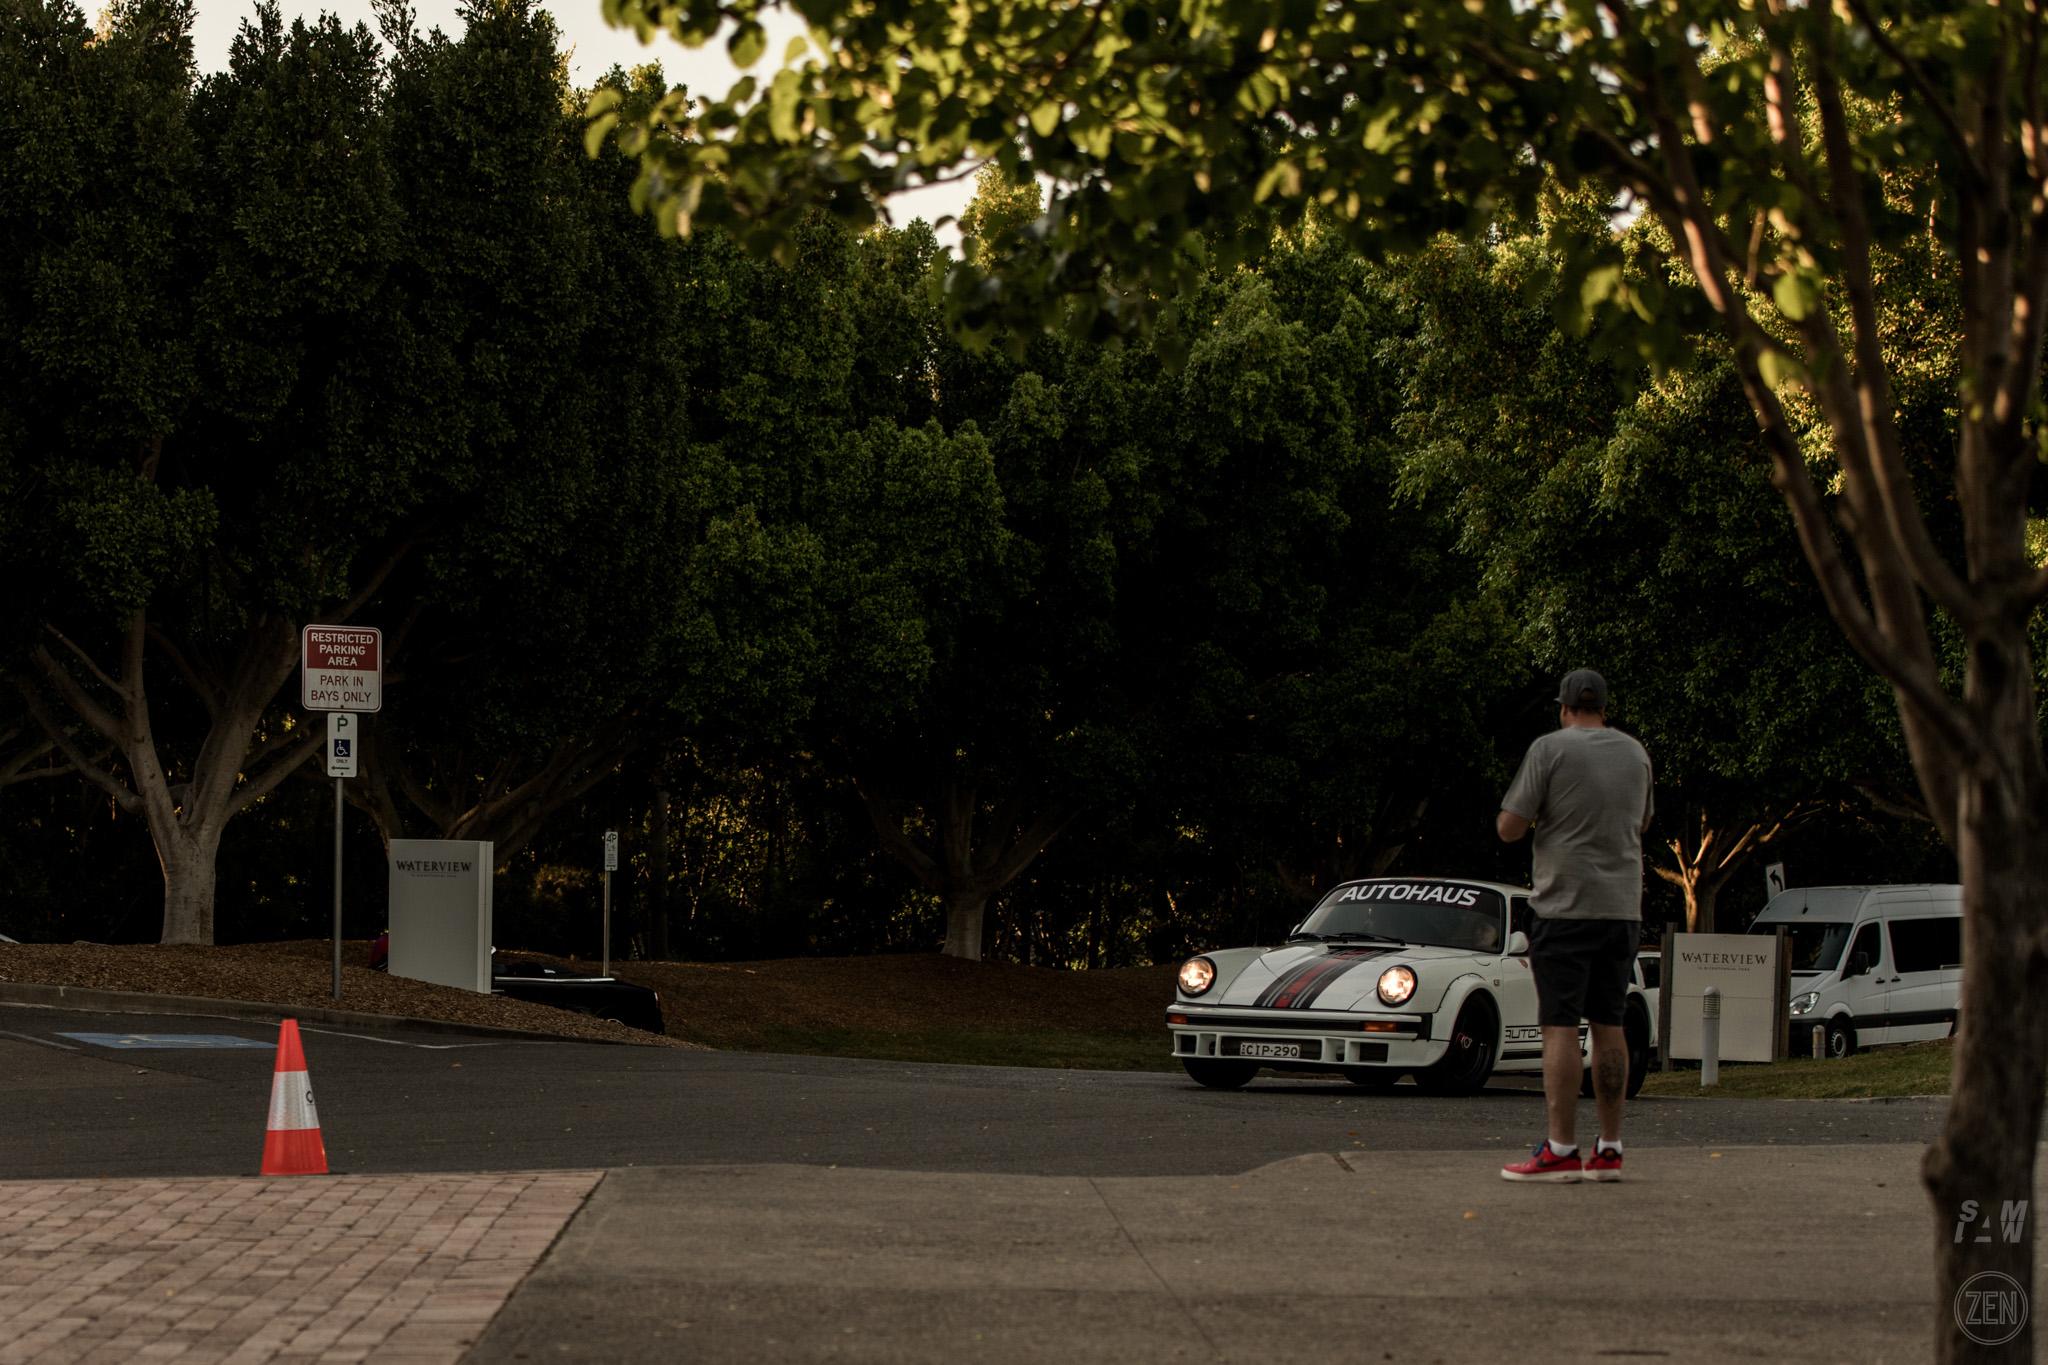 2019-10-27 - Autohaus Porsches & Coffee 031